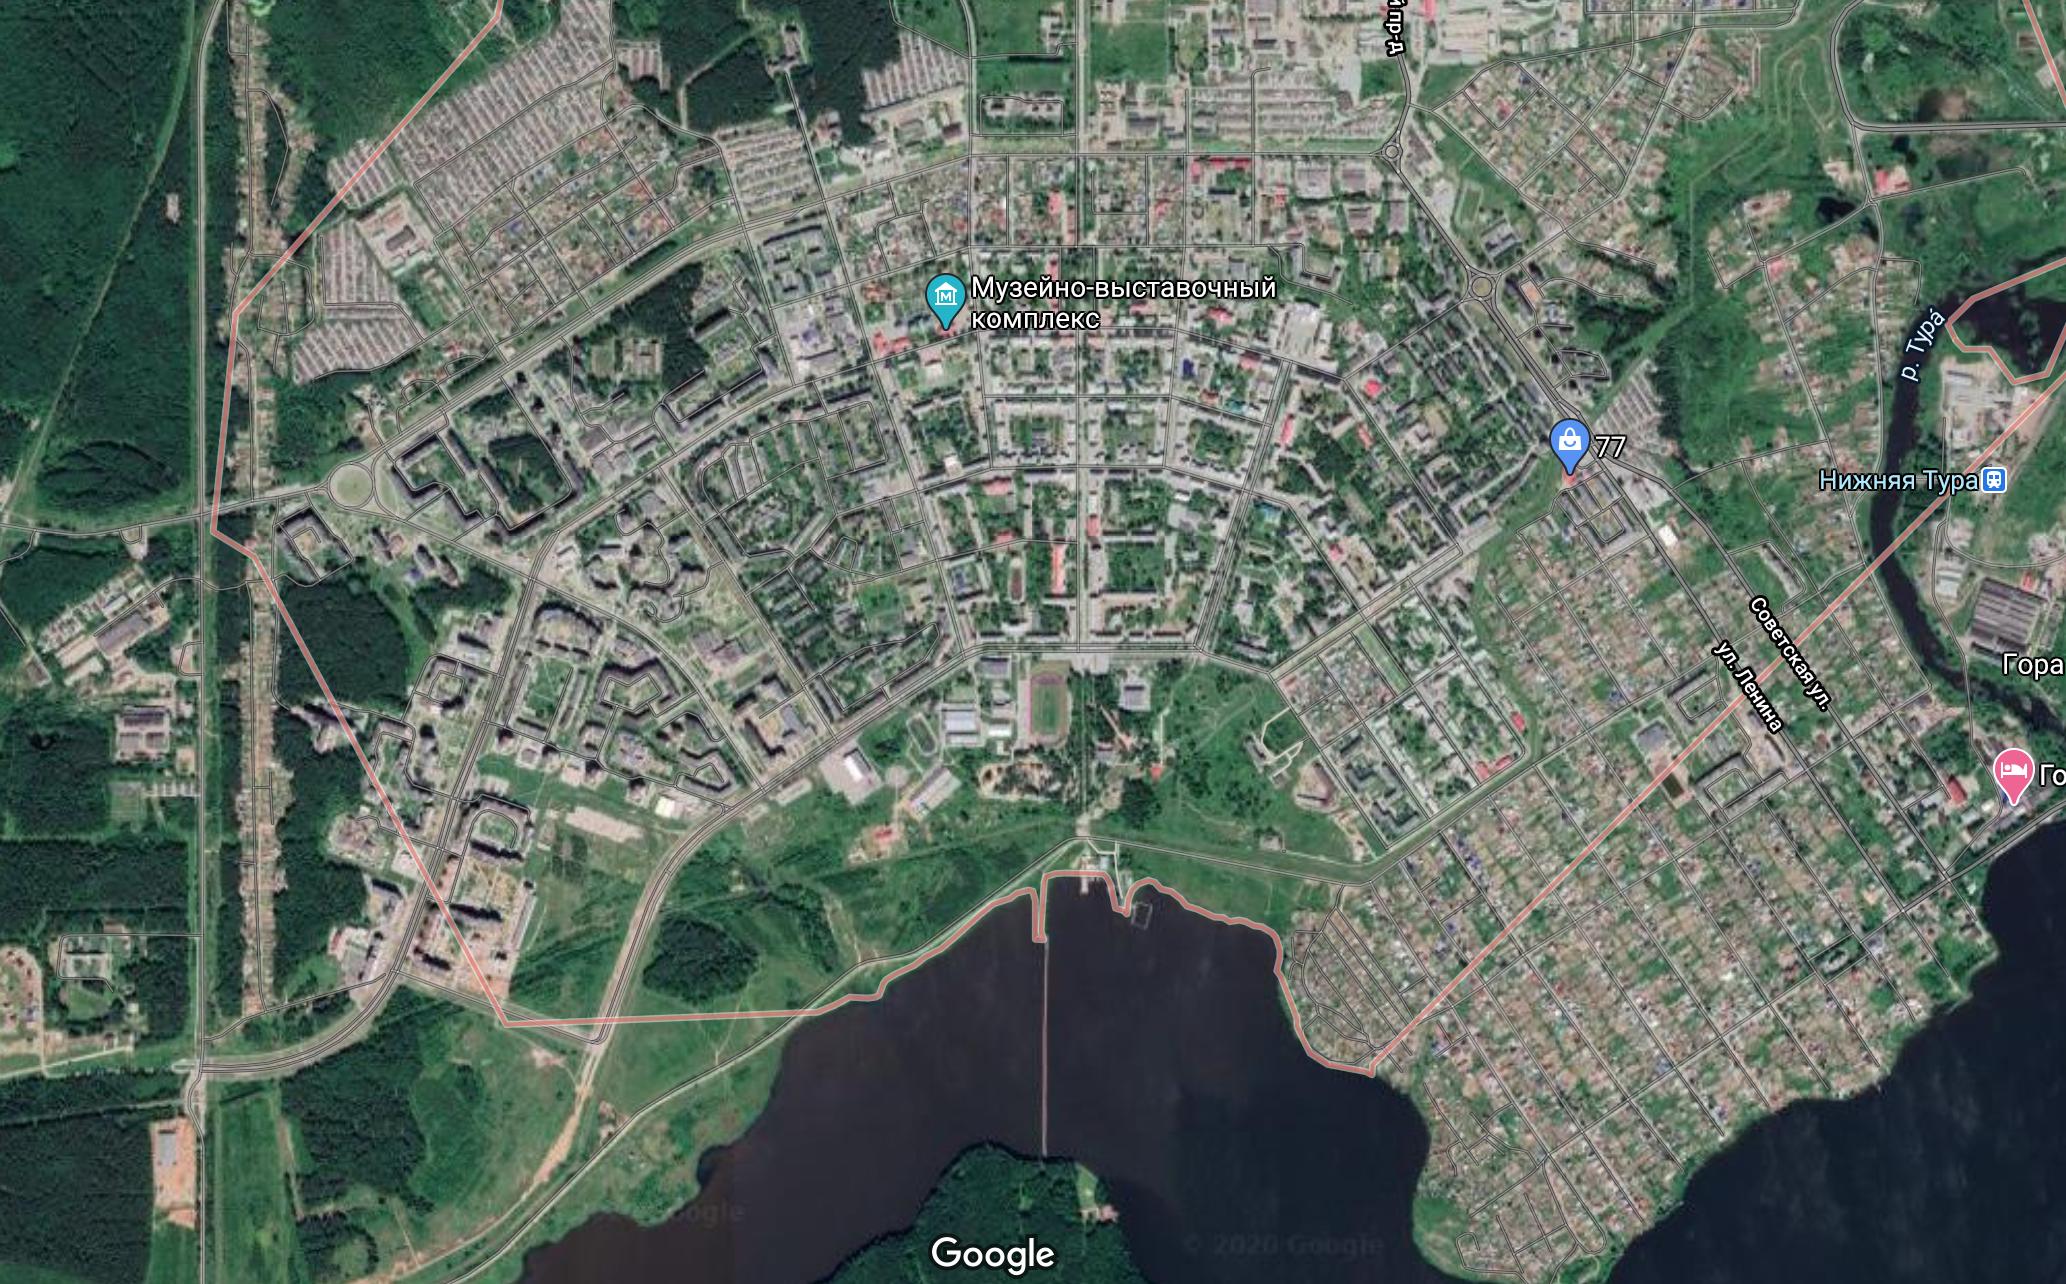 Sverdlovsk-45, Russia